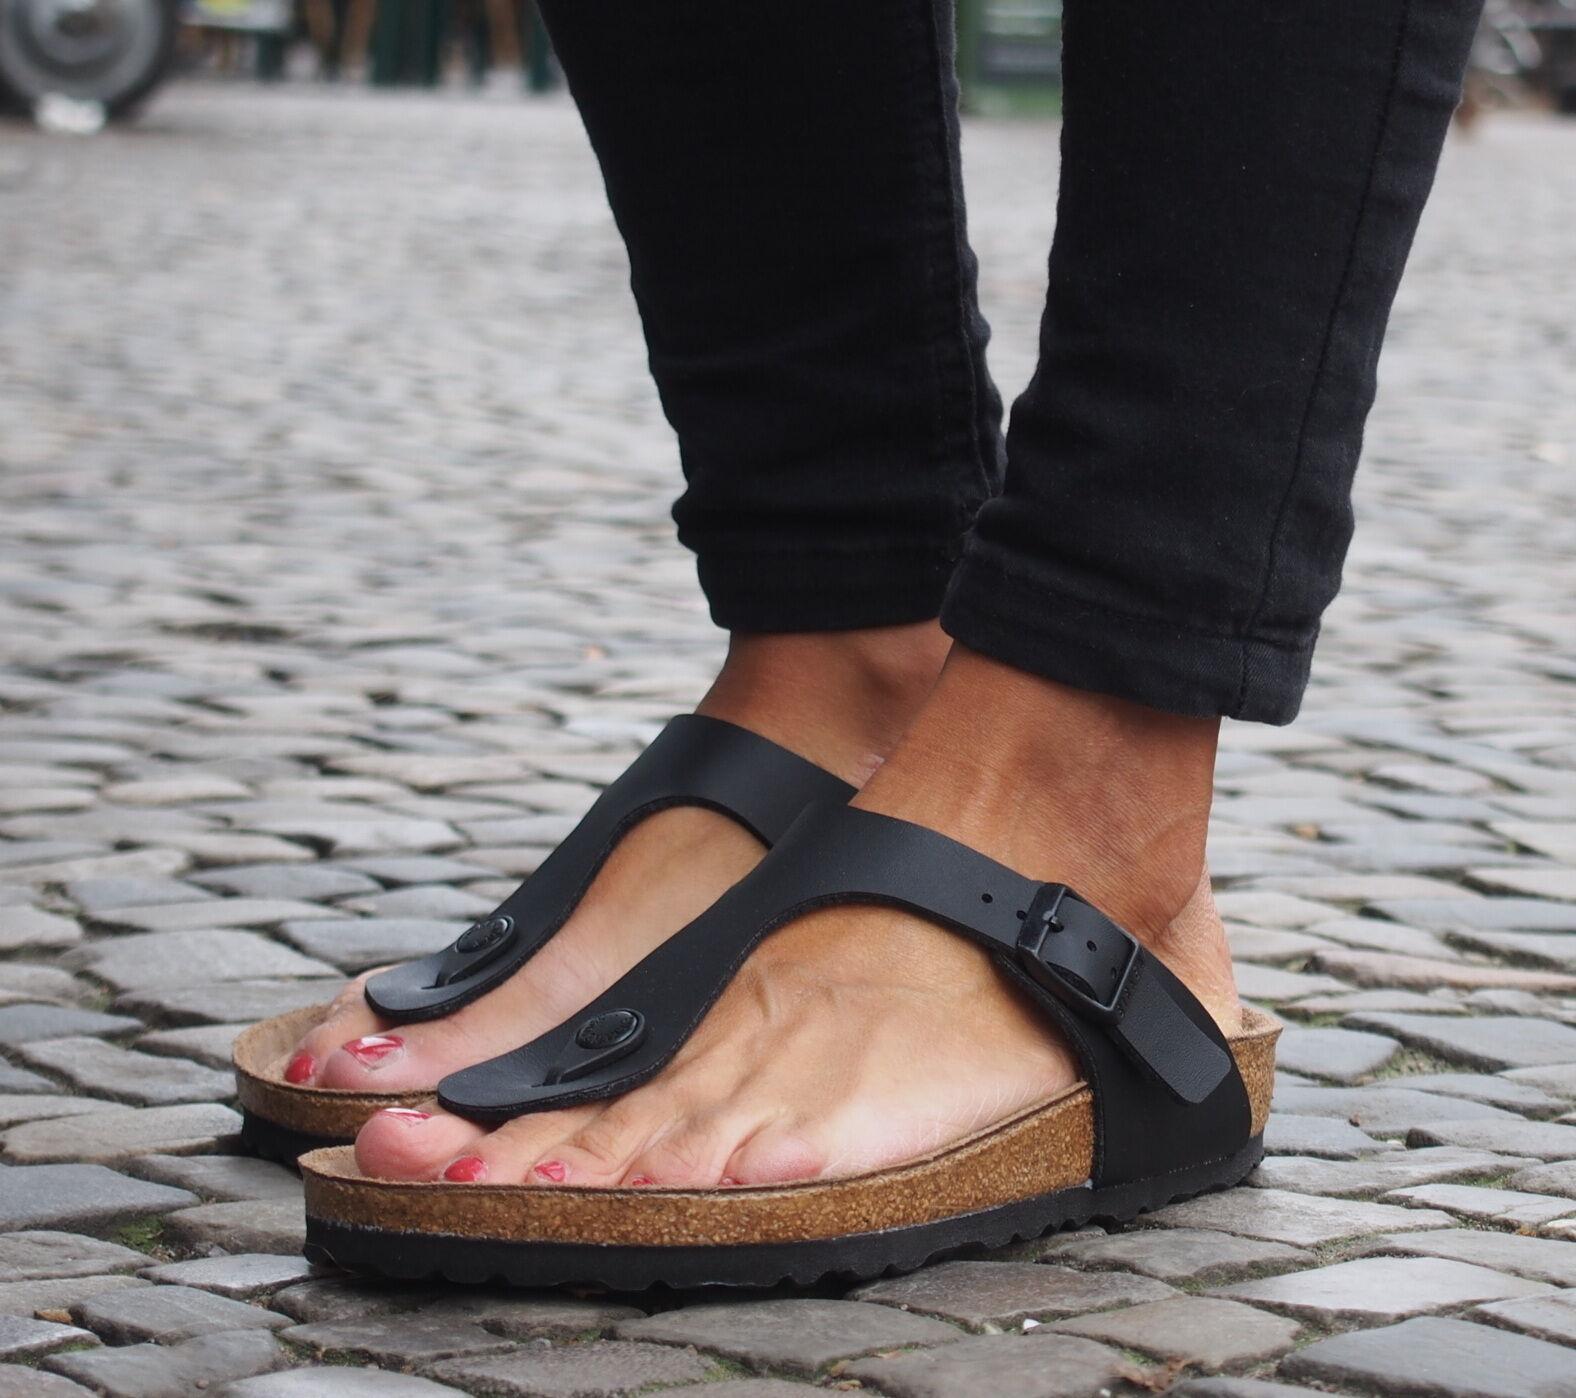 Birkenstock GIZEH BF schwarz schwarz Damen Sommerschuhe Birkoflor 691 NEU Sandale